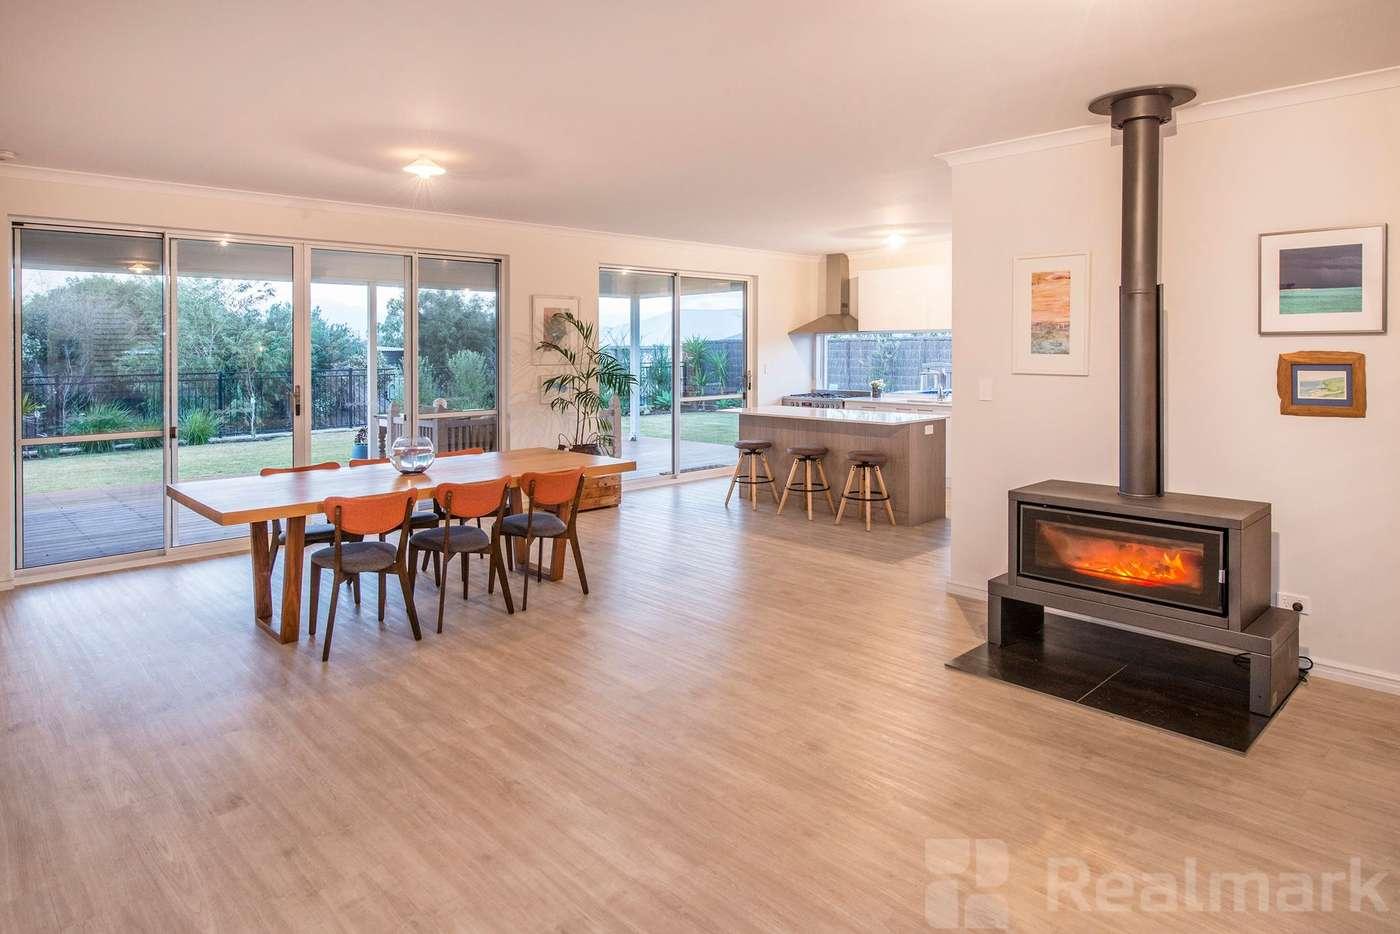 Main view of Homely house listing, 2 Pinehurst Crescent, Dunsborough WA 6281